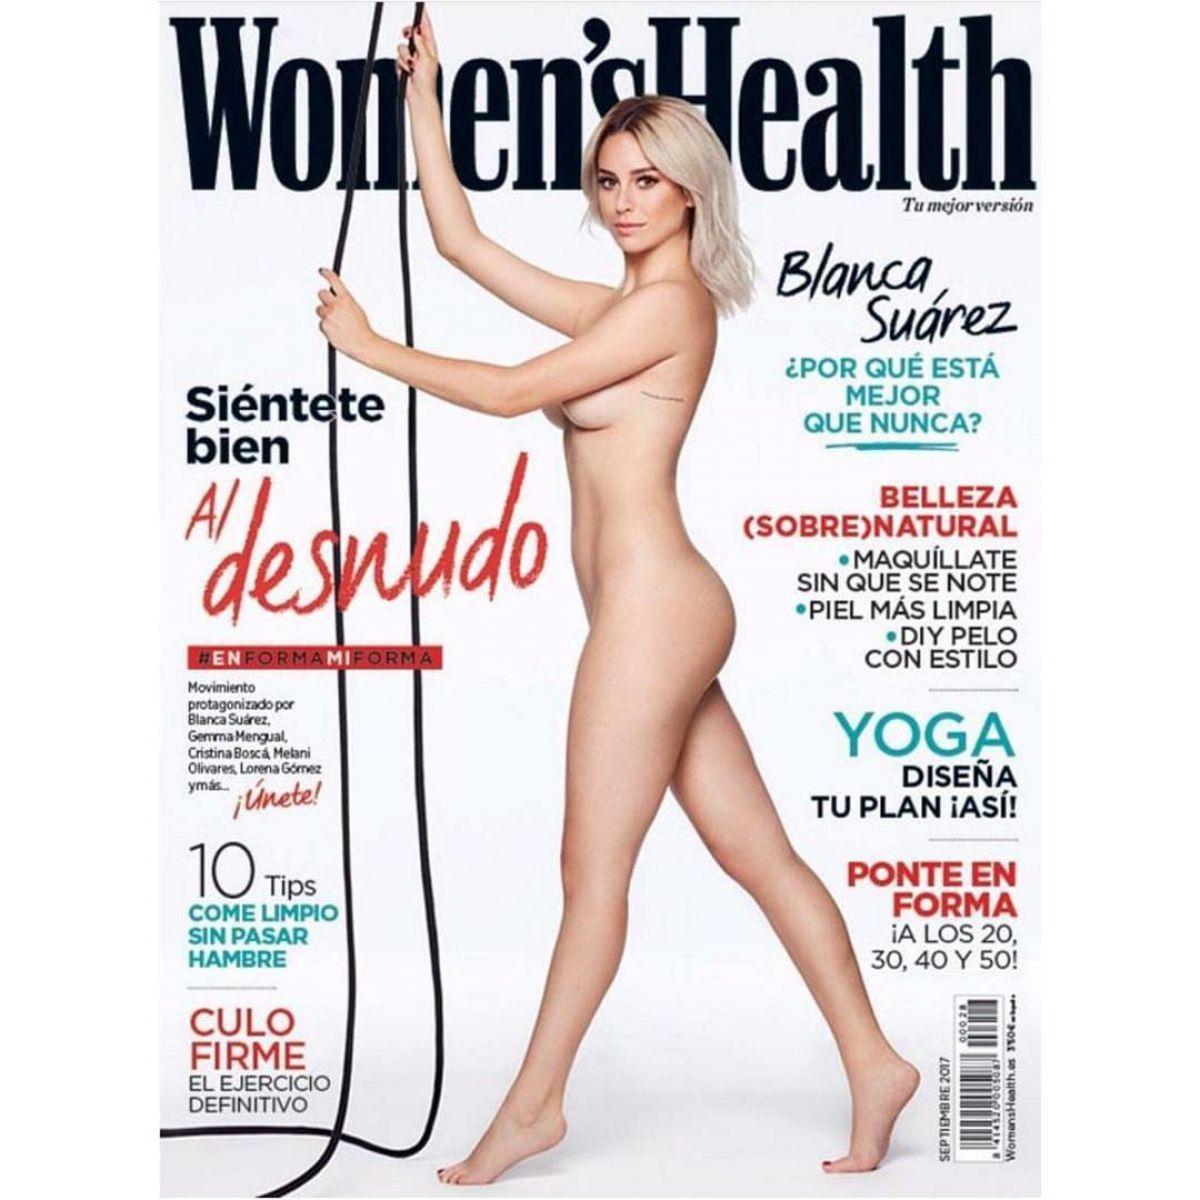 BLANCA SUAREZ for Women